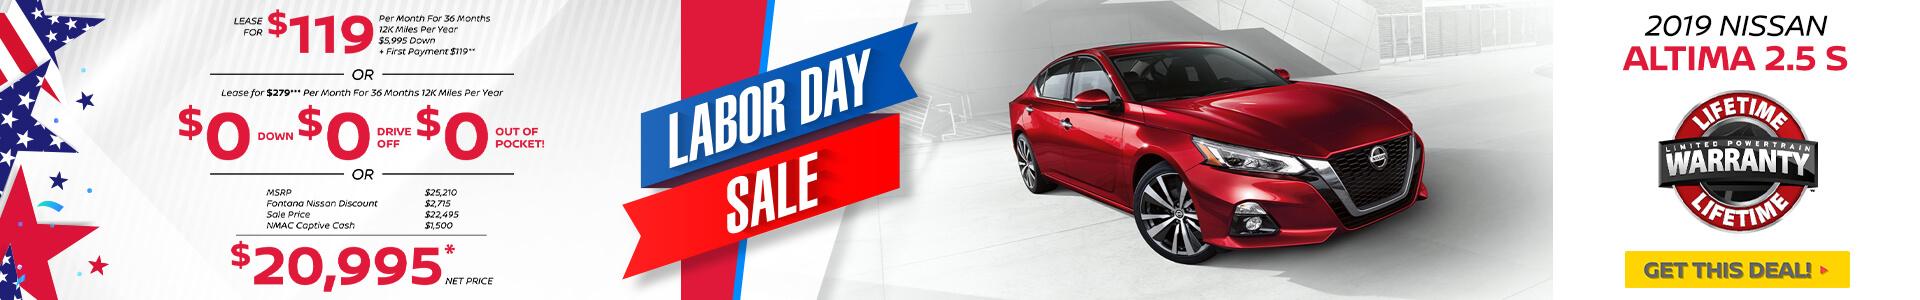 Nissan Altima $119 Lease